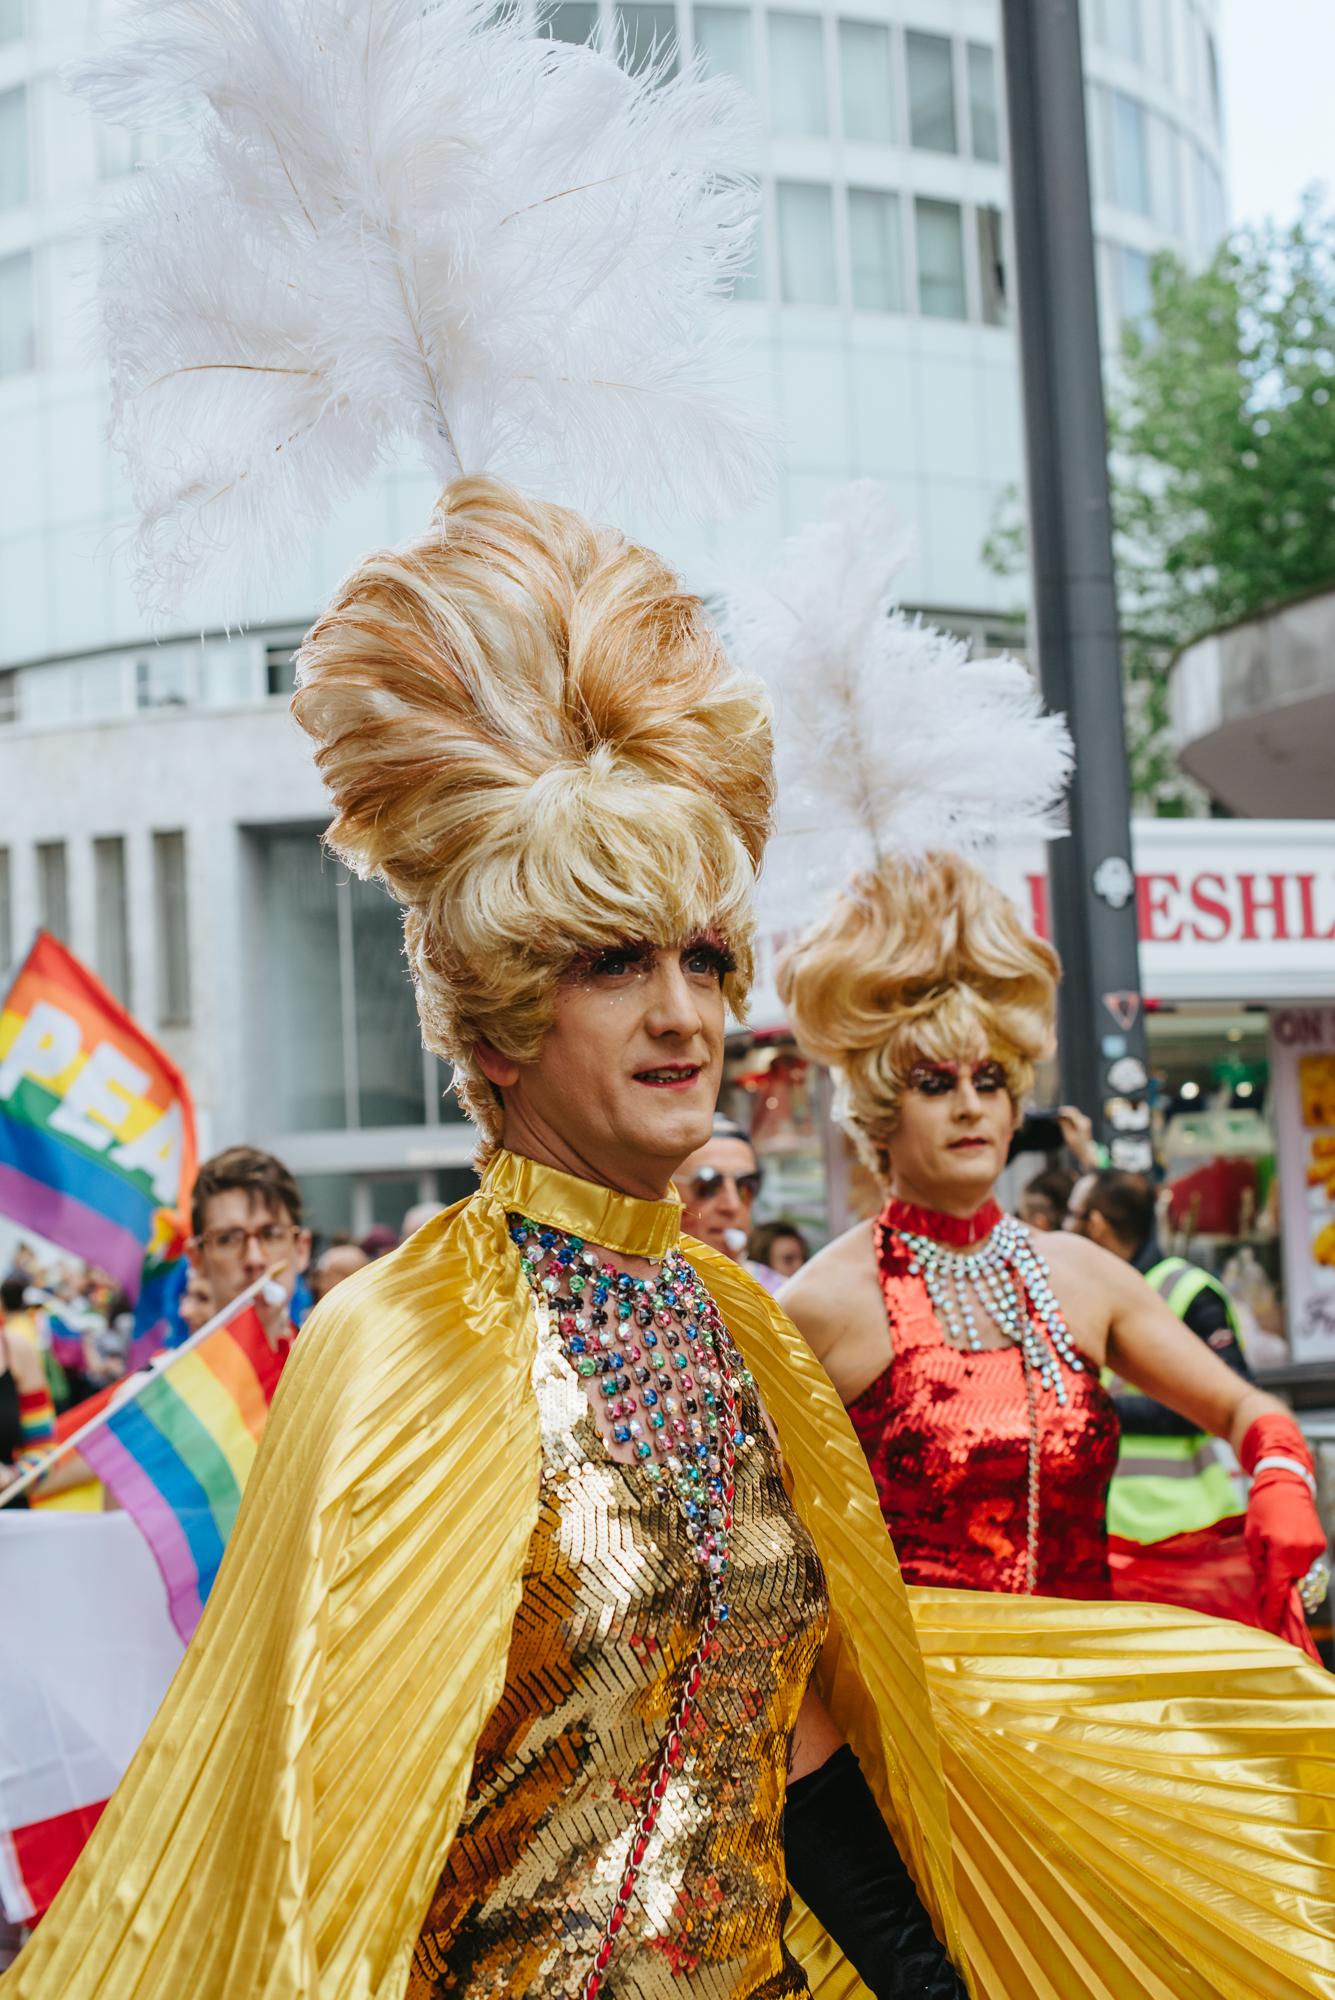 Birmingham-Pride-Parade-20170527-0161-Hanny-Foxhall.jpg